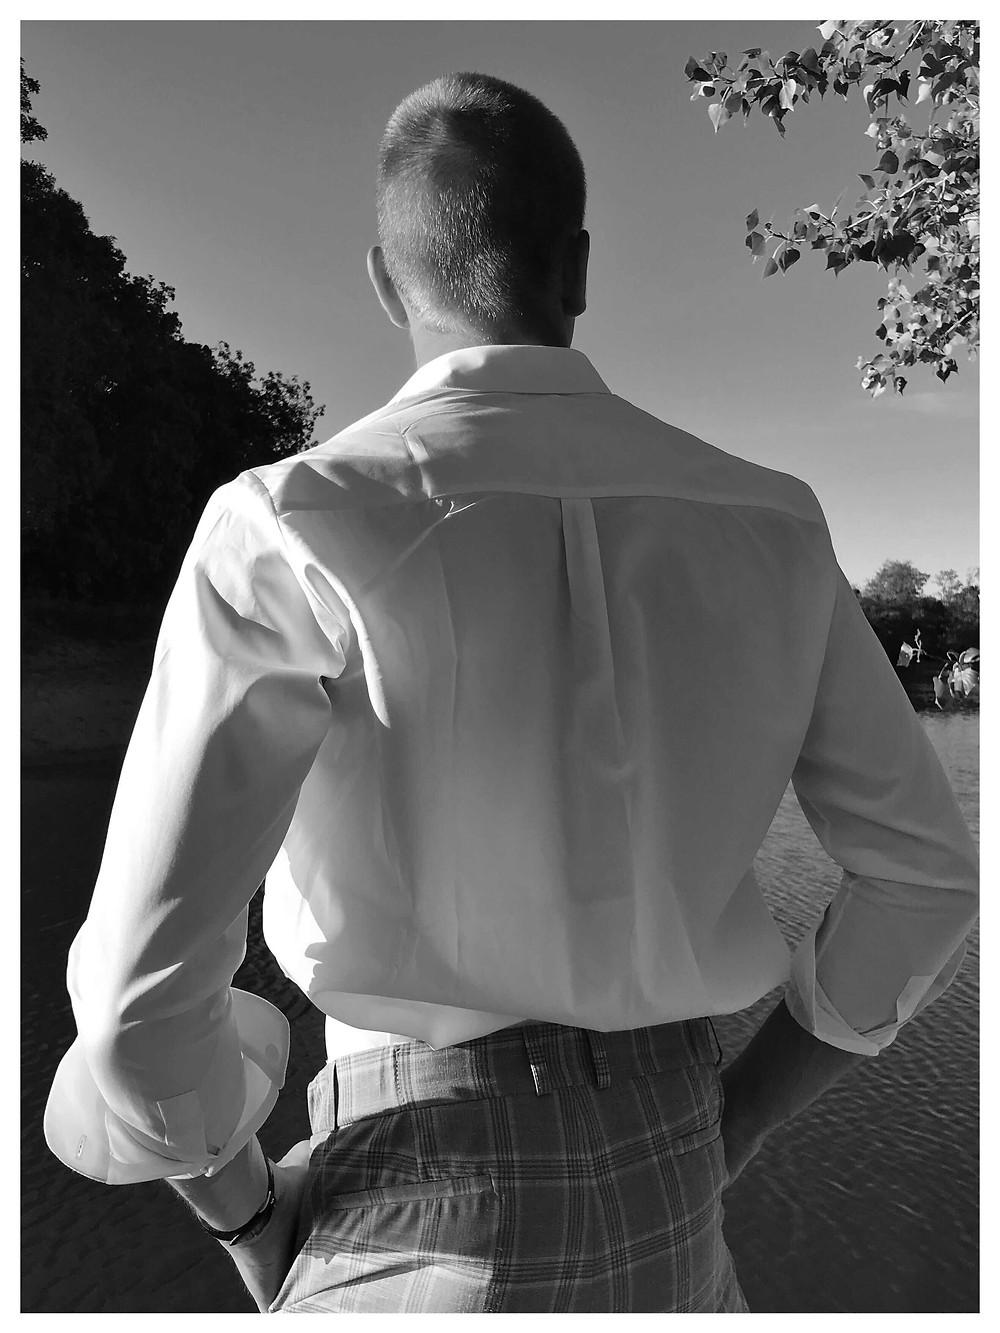 gingeralouest - blog - mode - éco- responsable - série - mode - masculine - image - ©gingeralouest